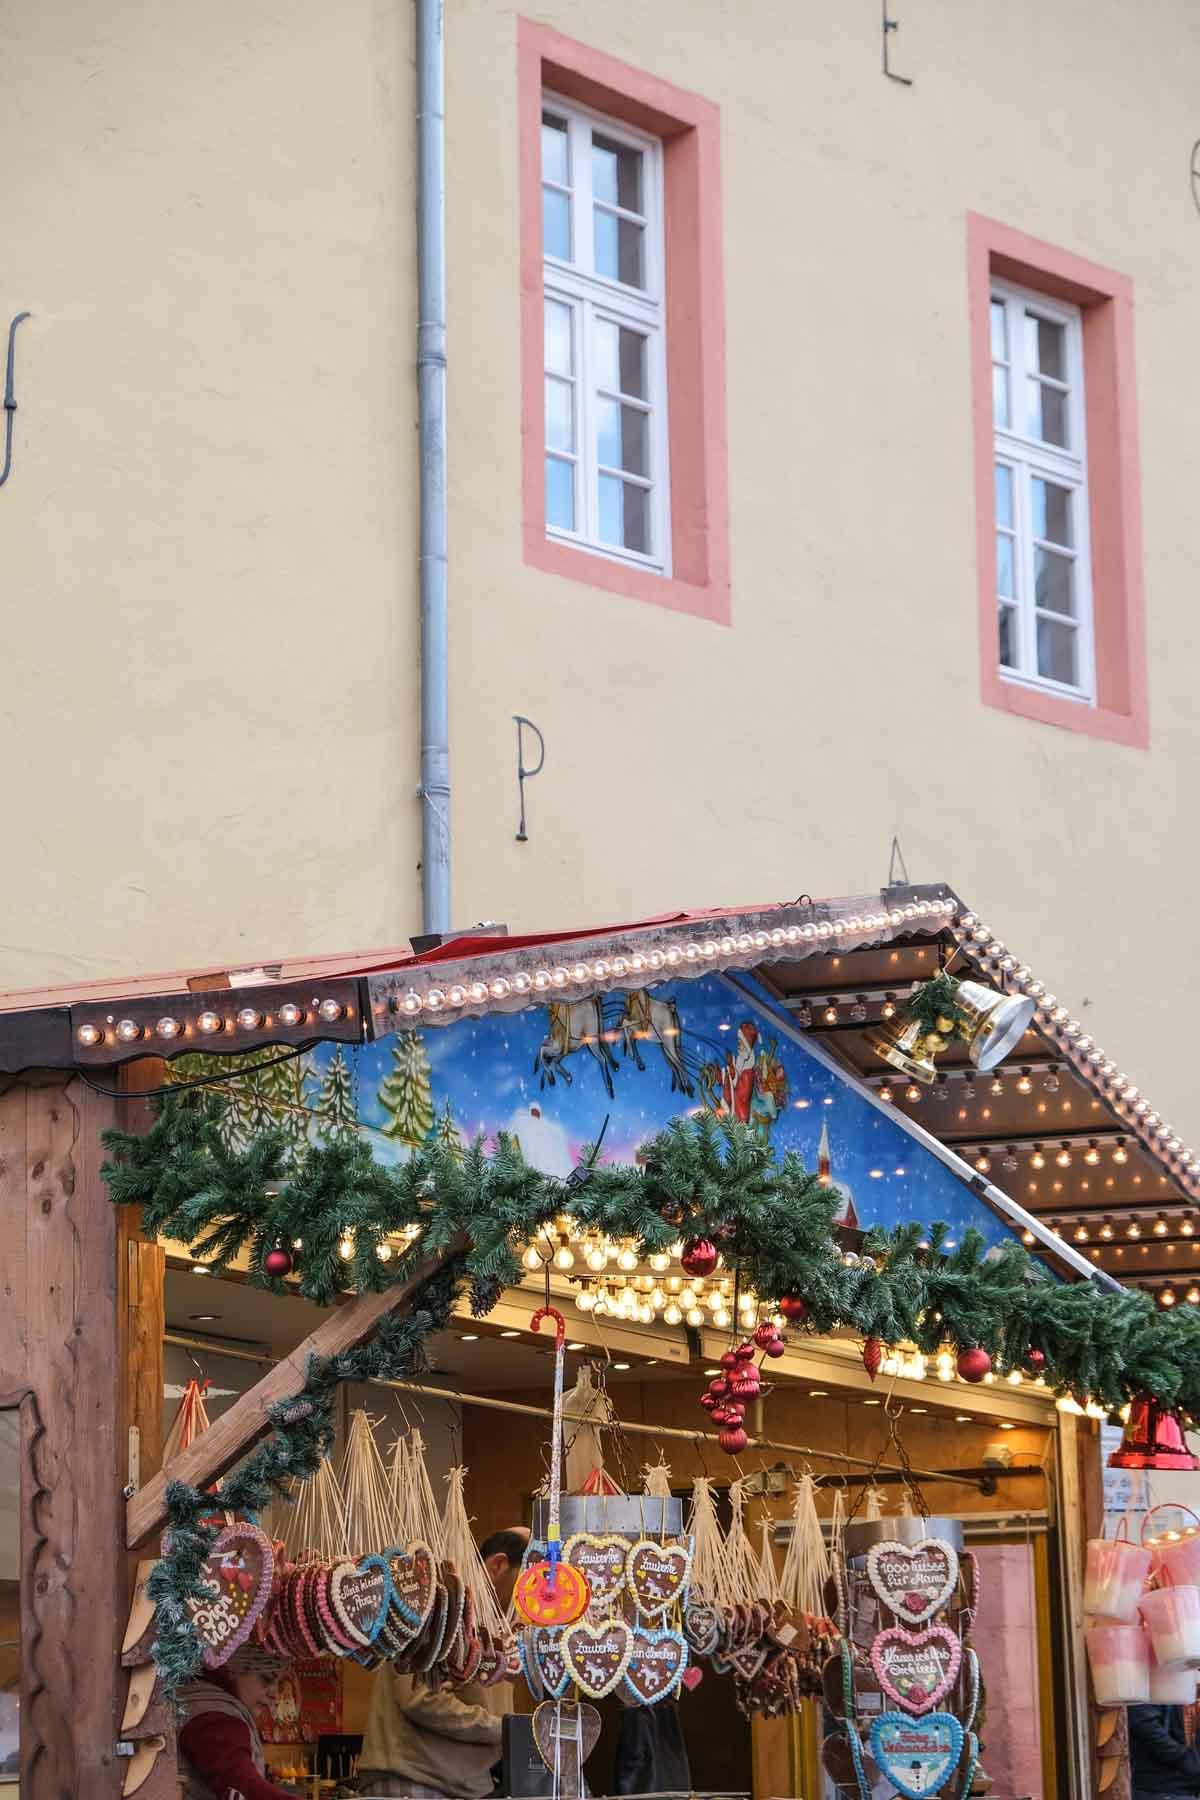 kerstmarkt Bad Münstereifel, Eifel, Duitsland